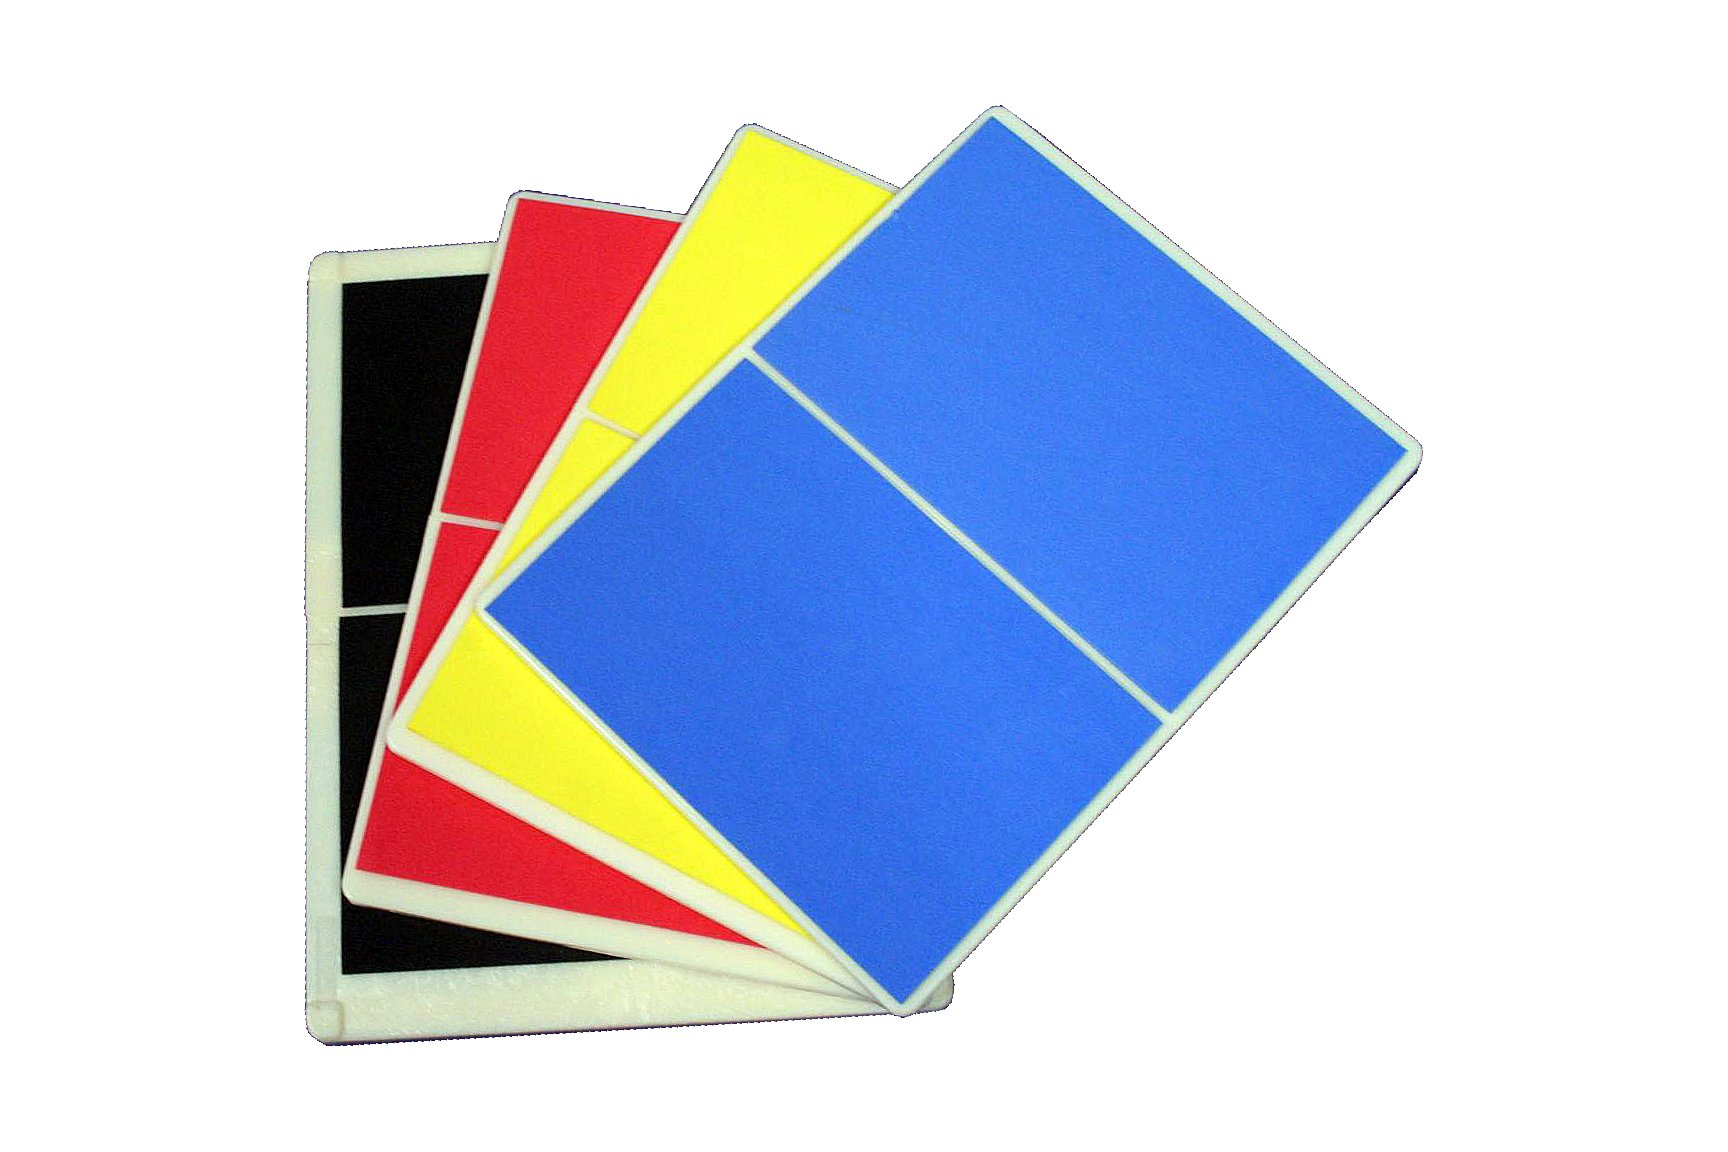 Average Blue Re-Breakable Board Karate Taekwondo Rebreakable Padded